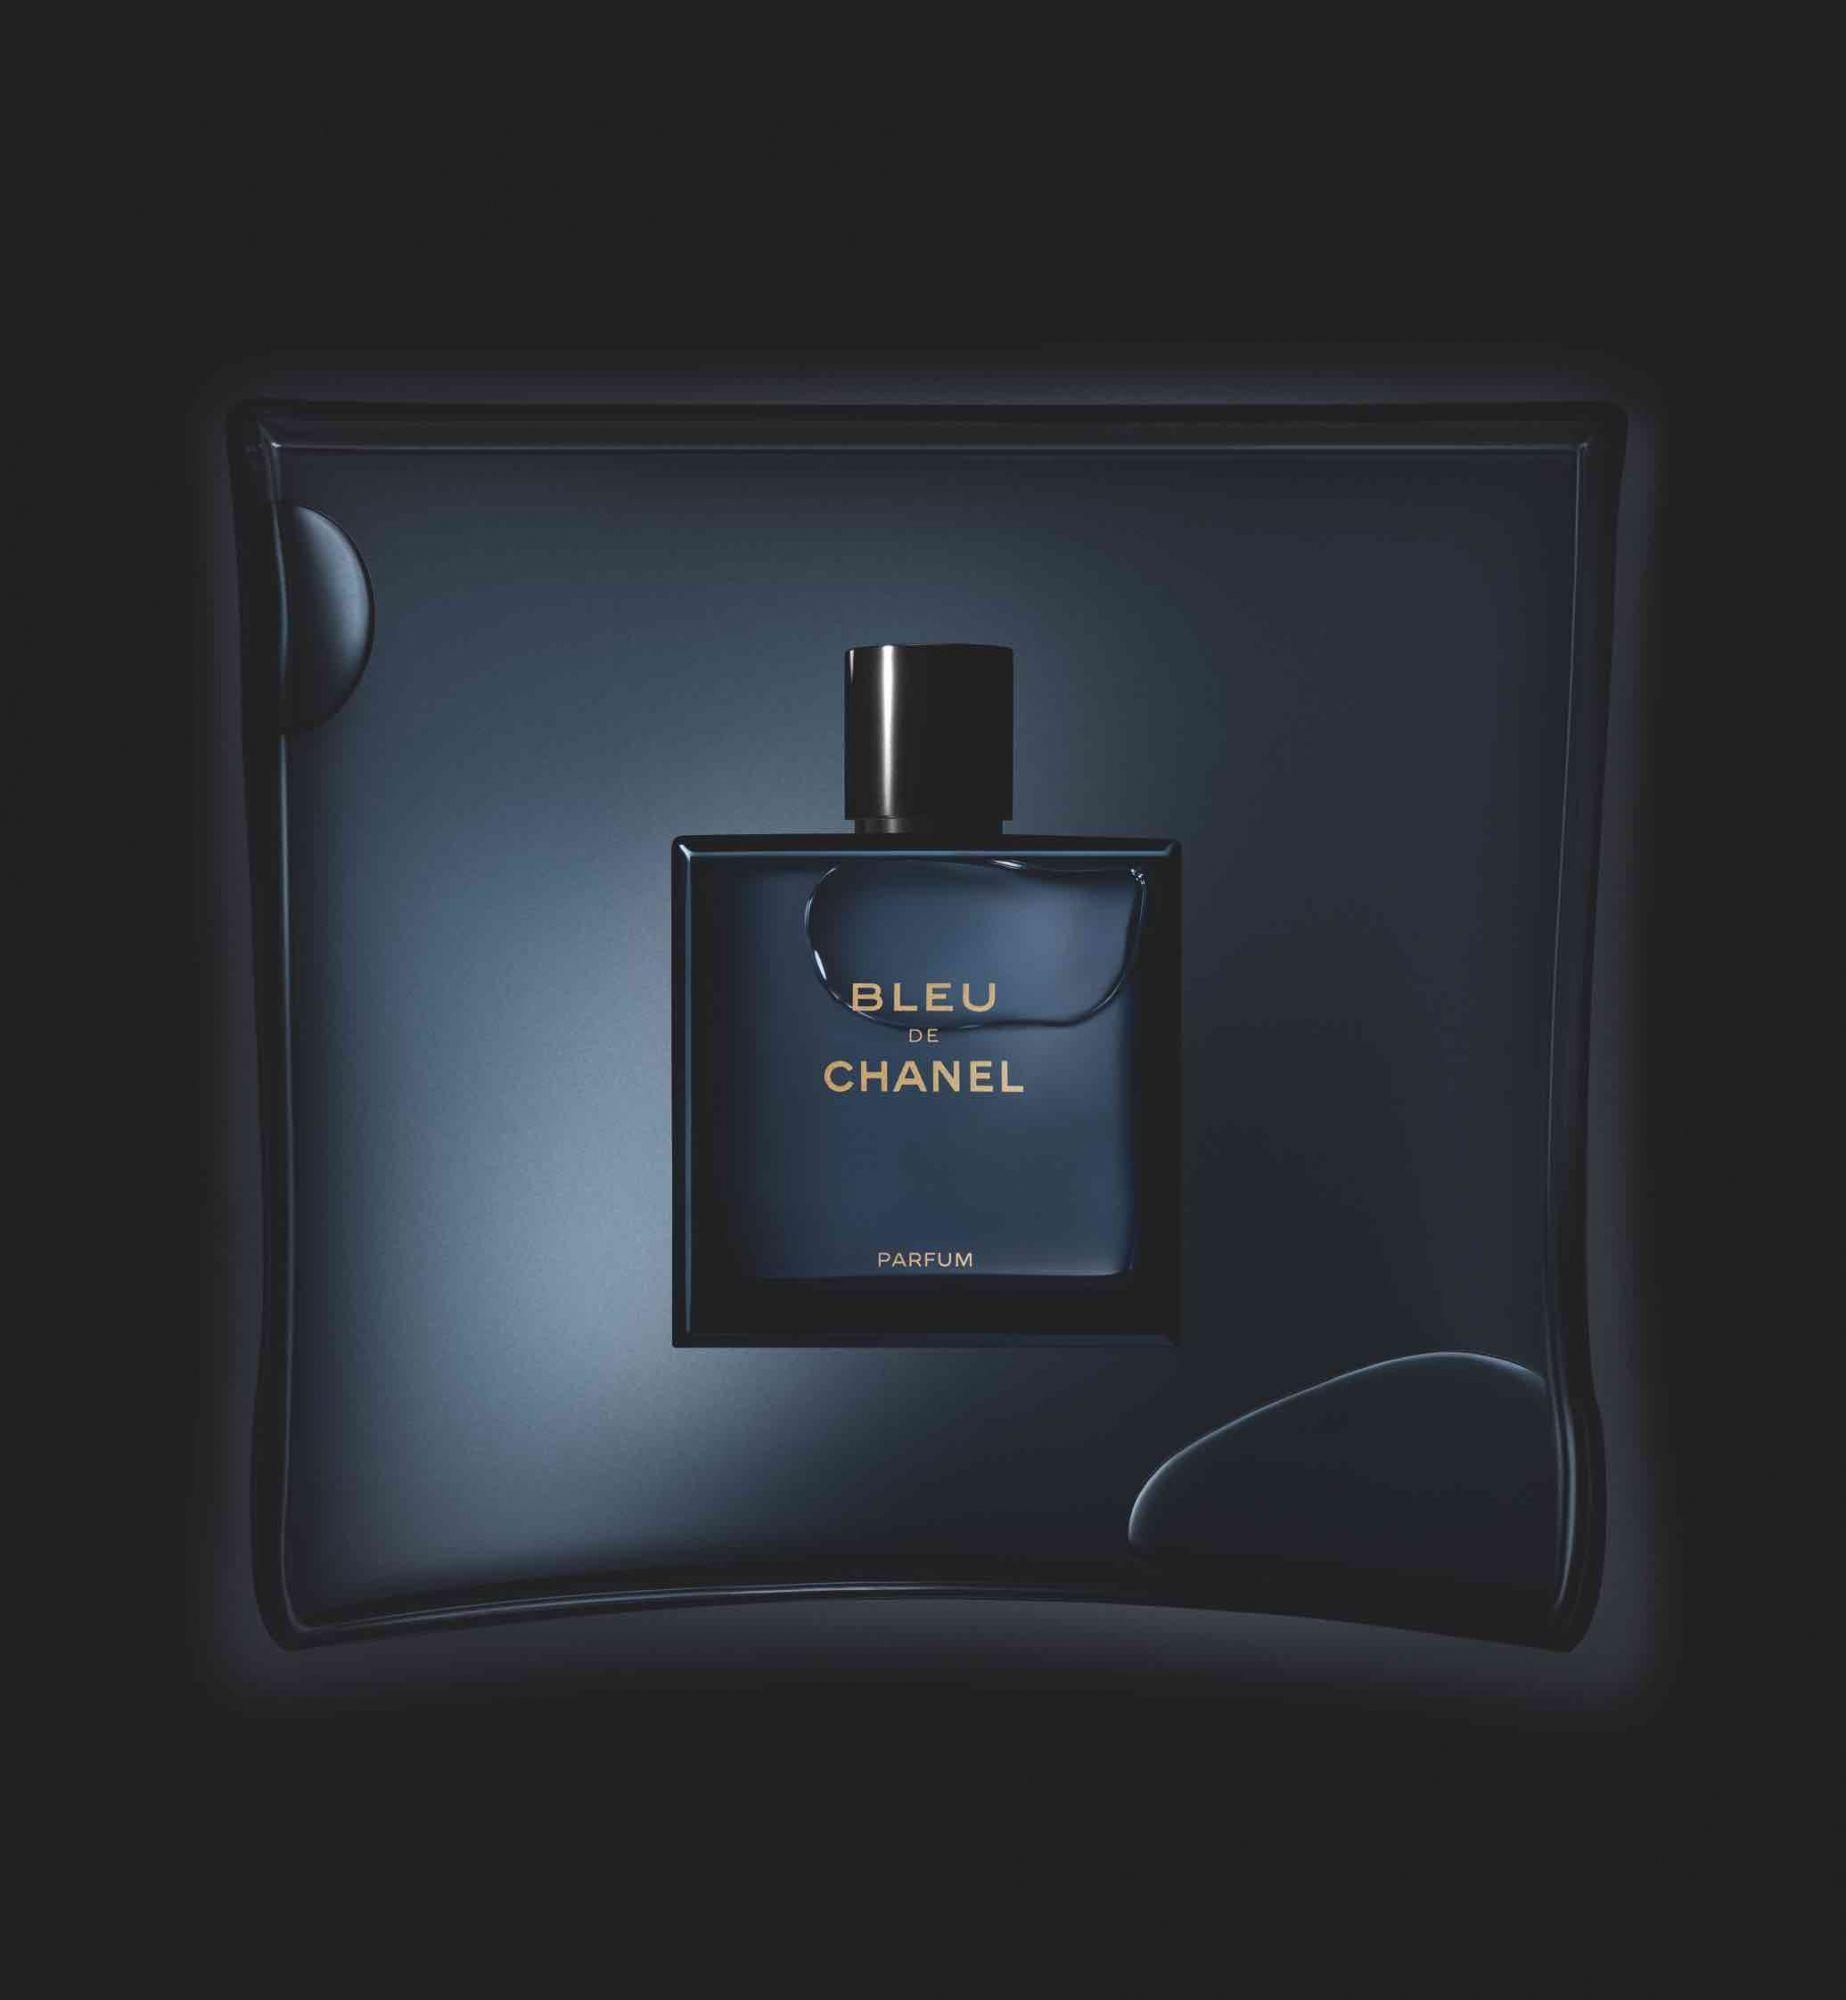 Chanel's Bleu de Chanel Ventures Into Parfum Territory